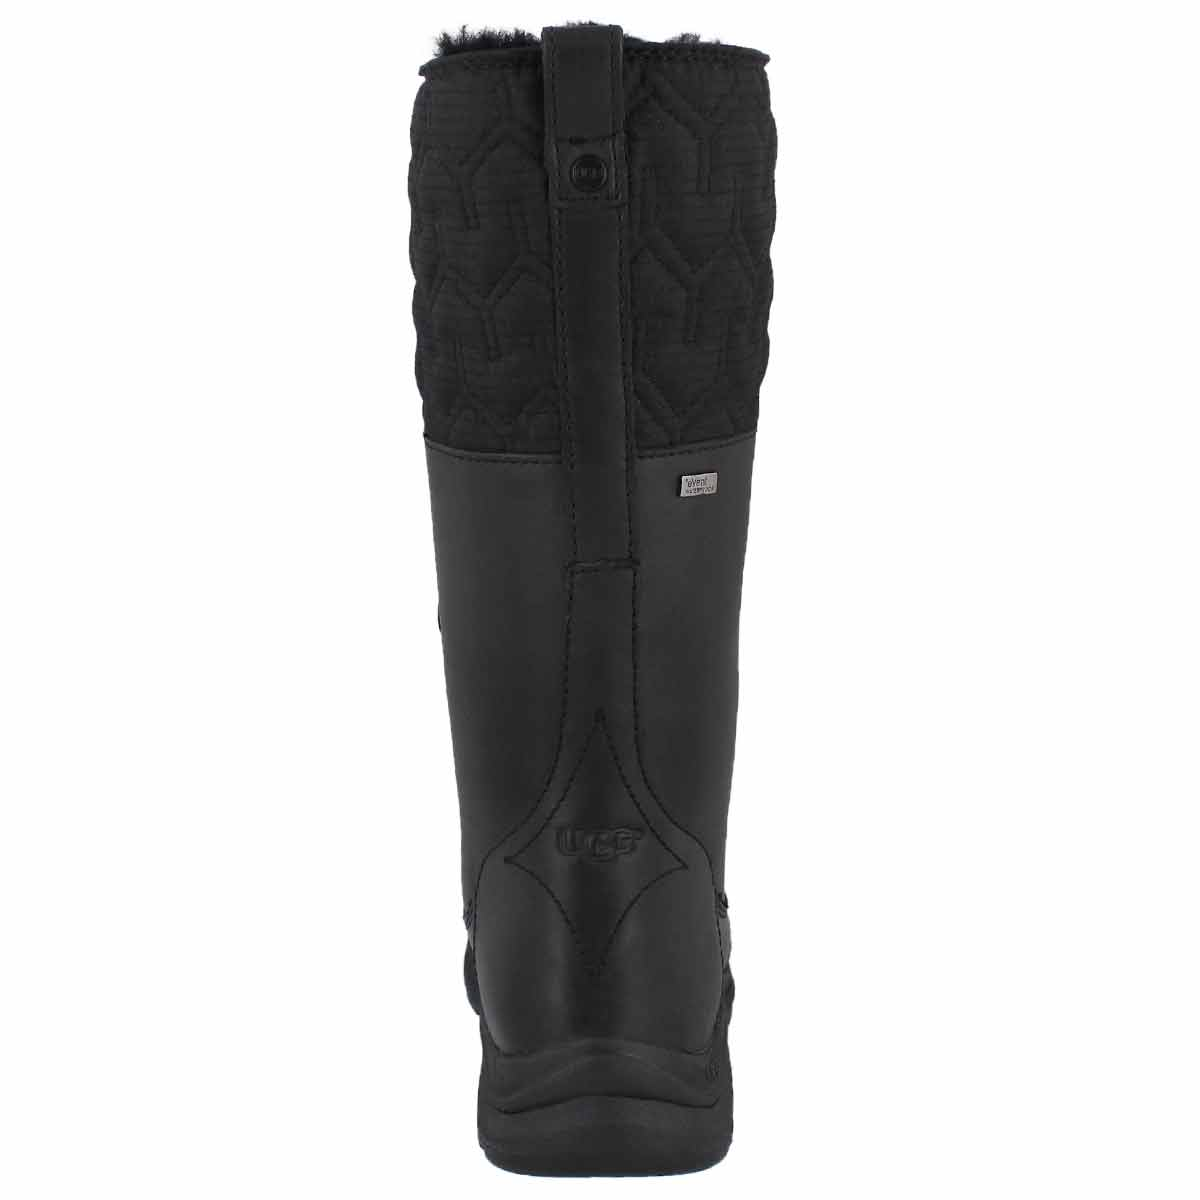 Lds Atlason black tall wtpf winter boot